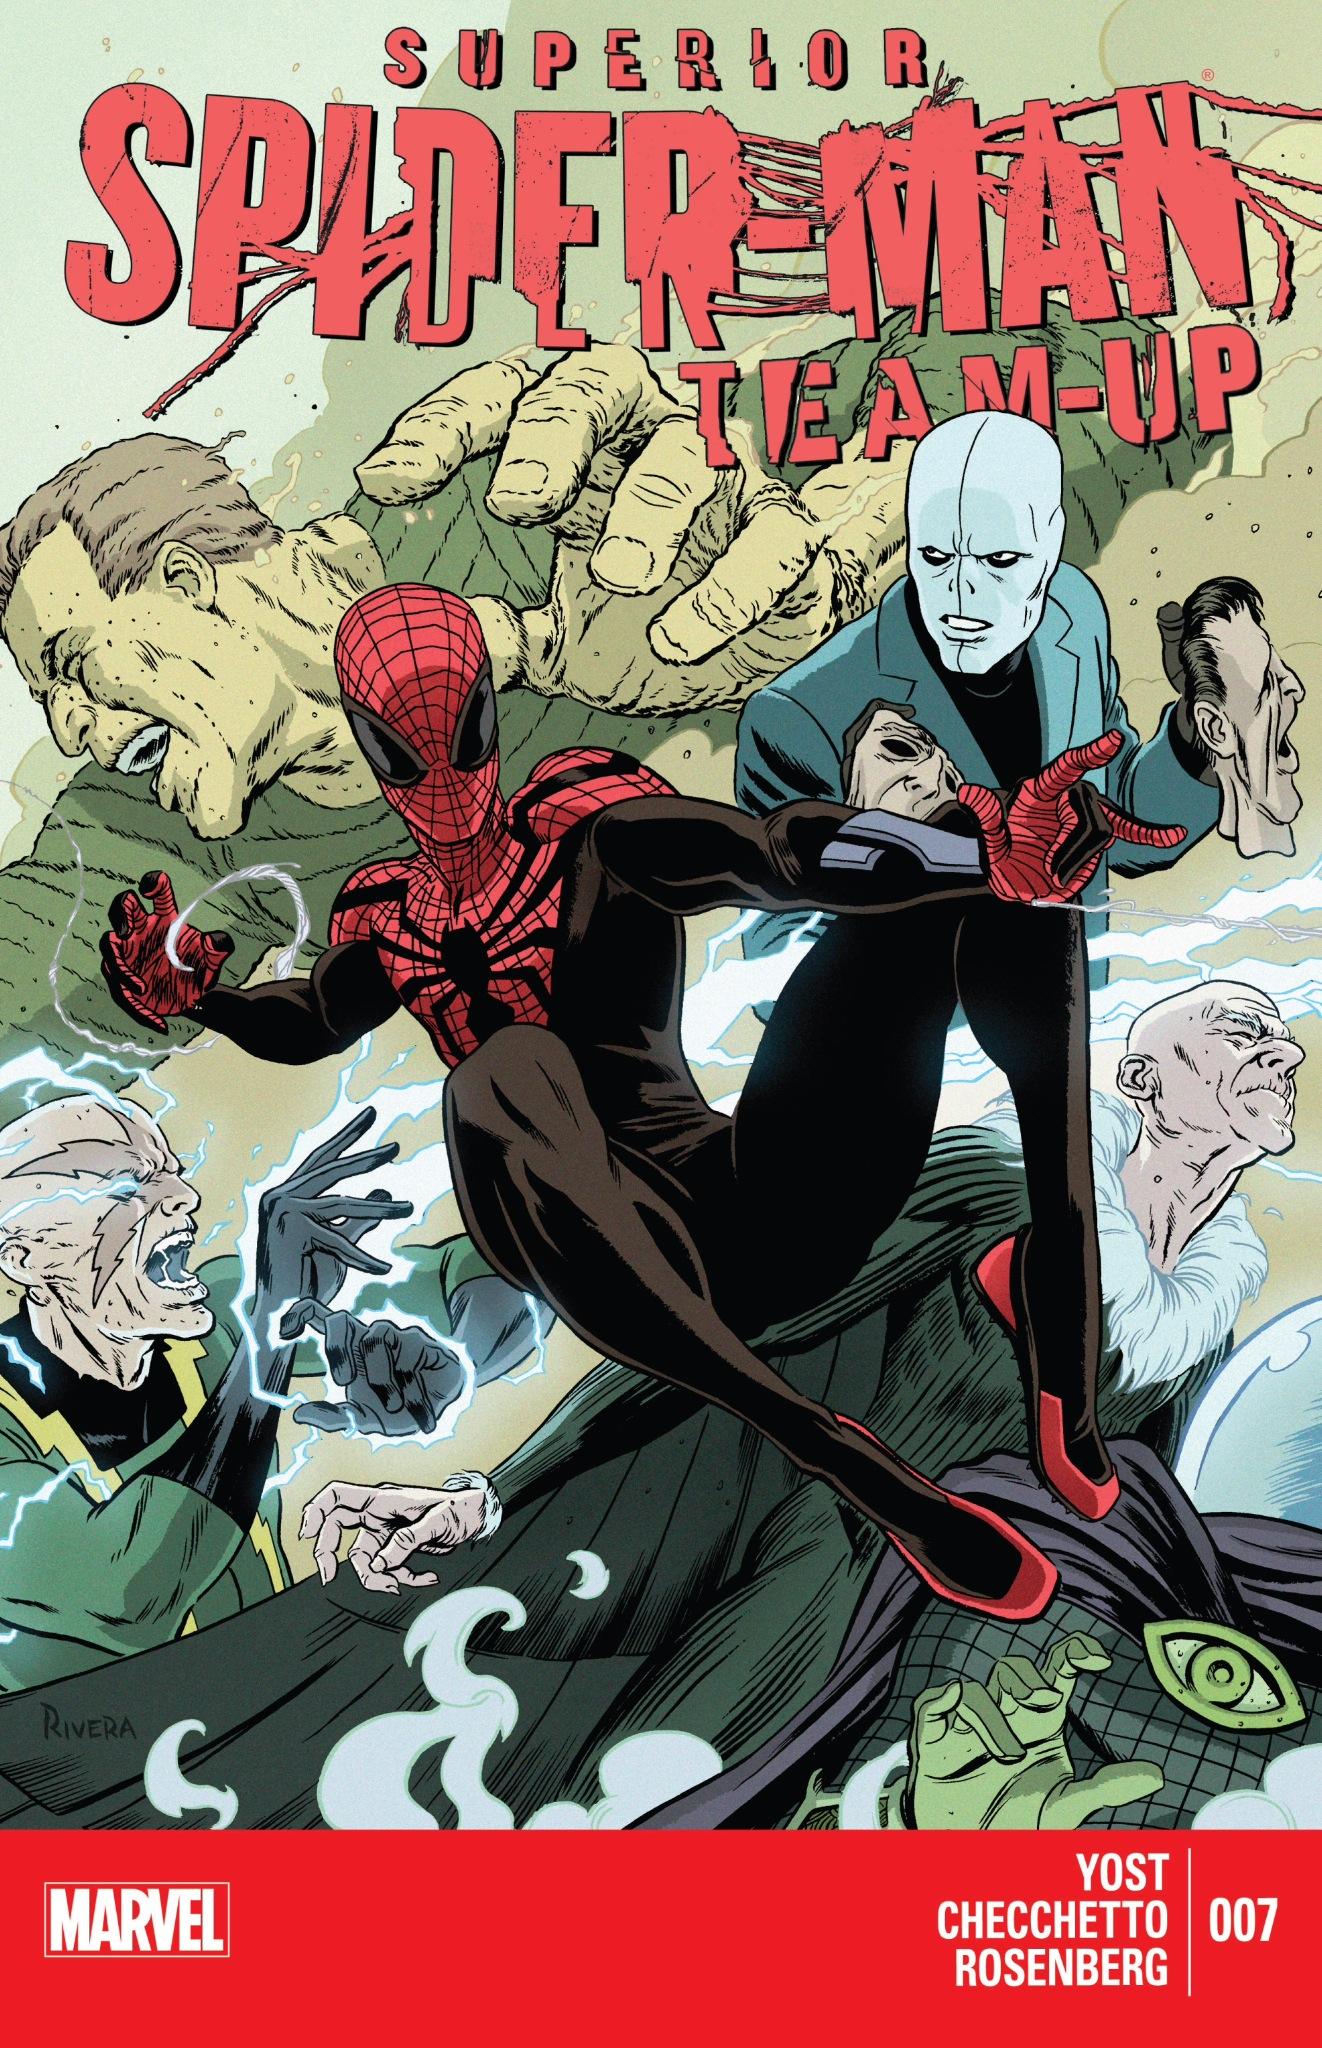 A marvel comics super special blade runner pdf download free internetmarketingthepiratebay - Marvel spiderman comics pdf ...